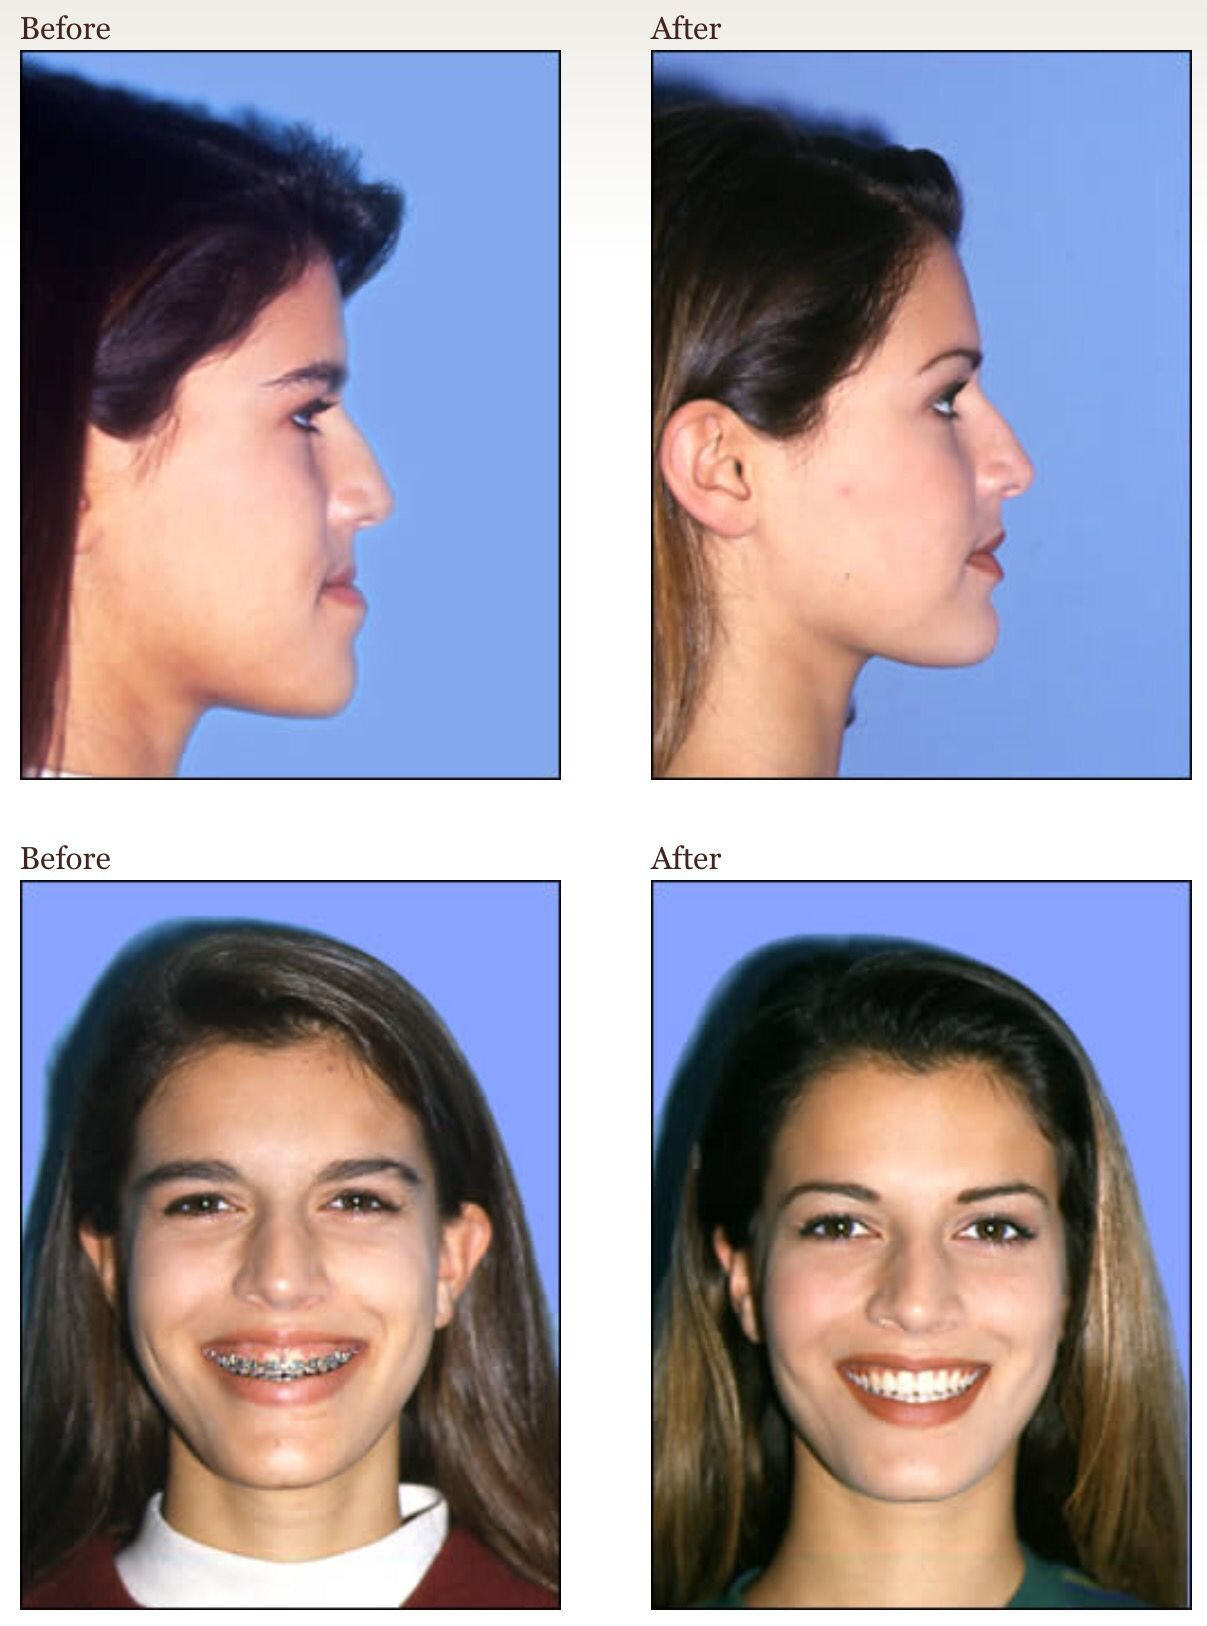 repositioned appearance underbite correct profile